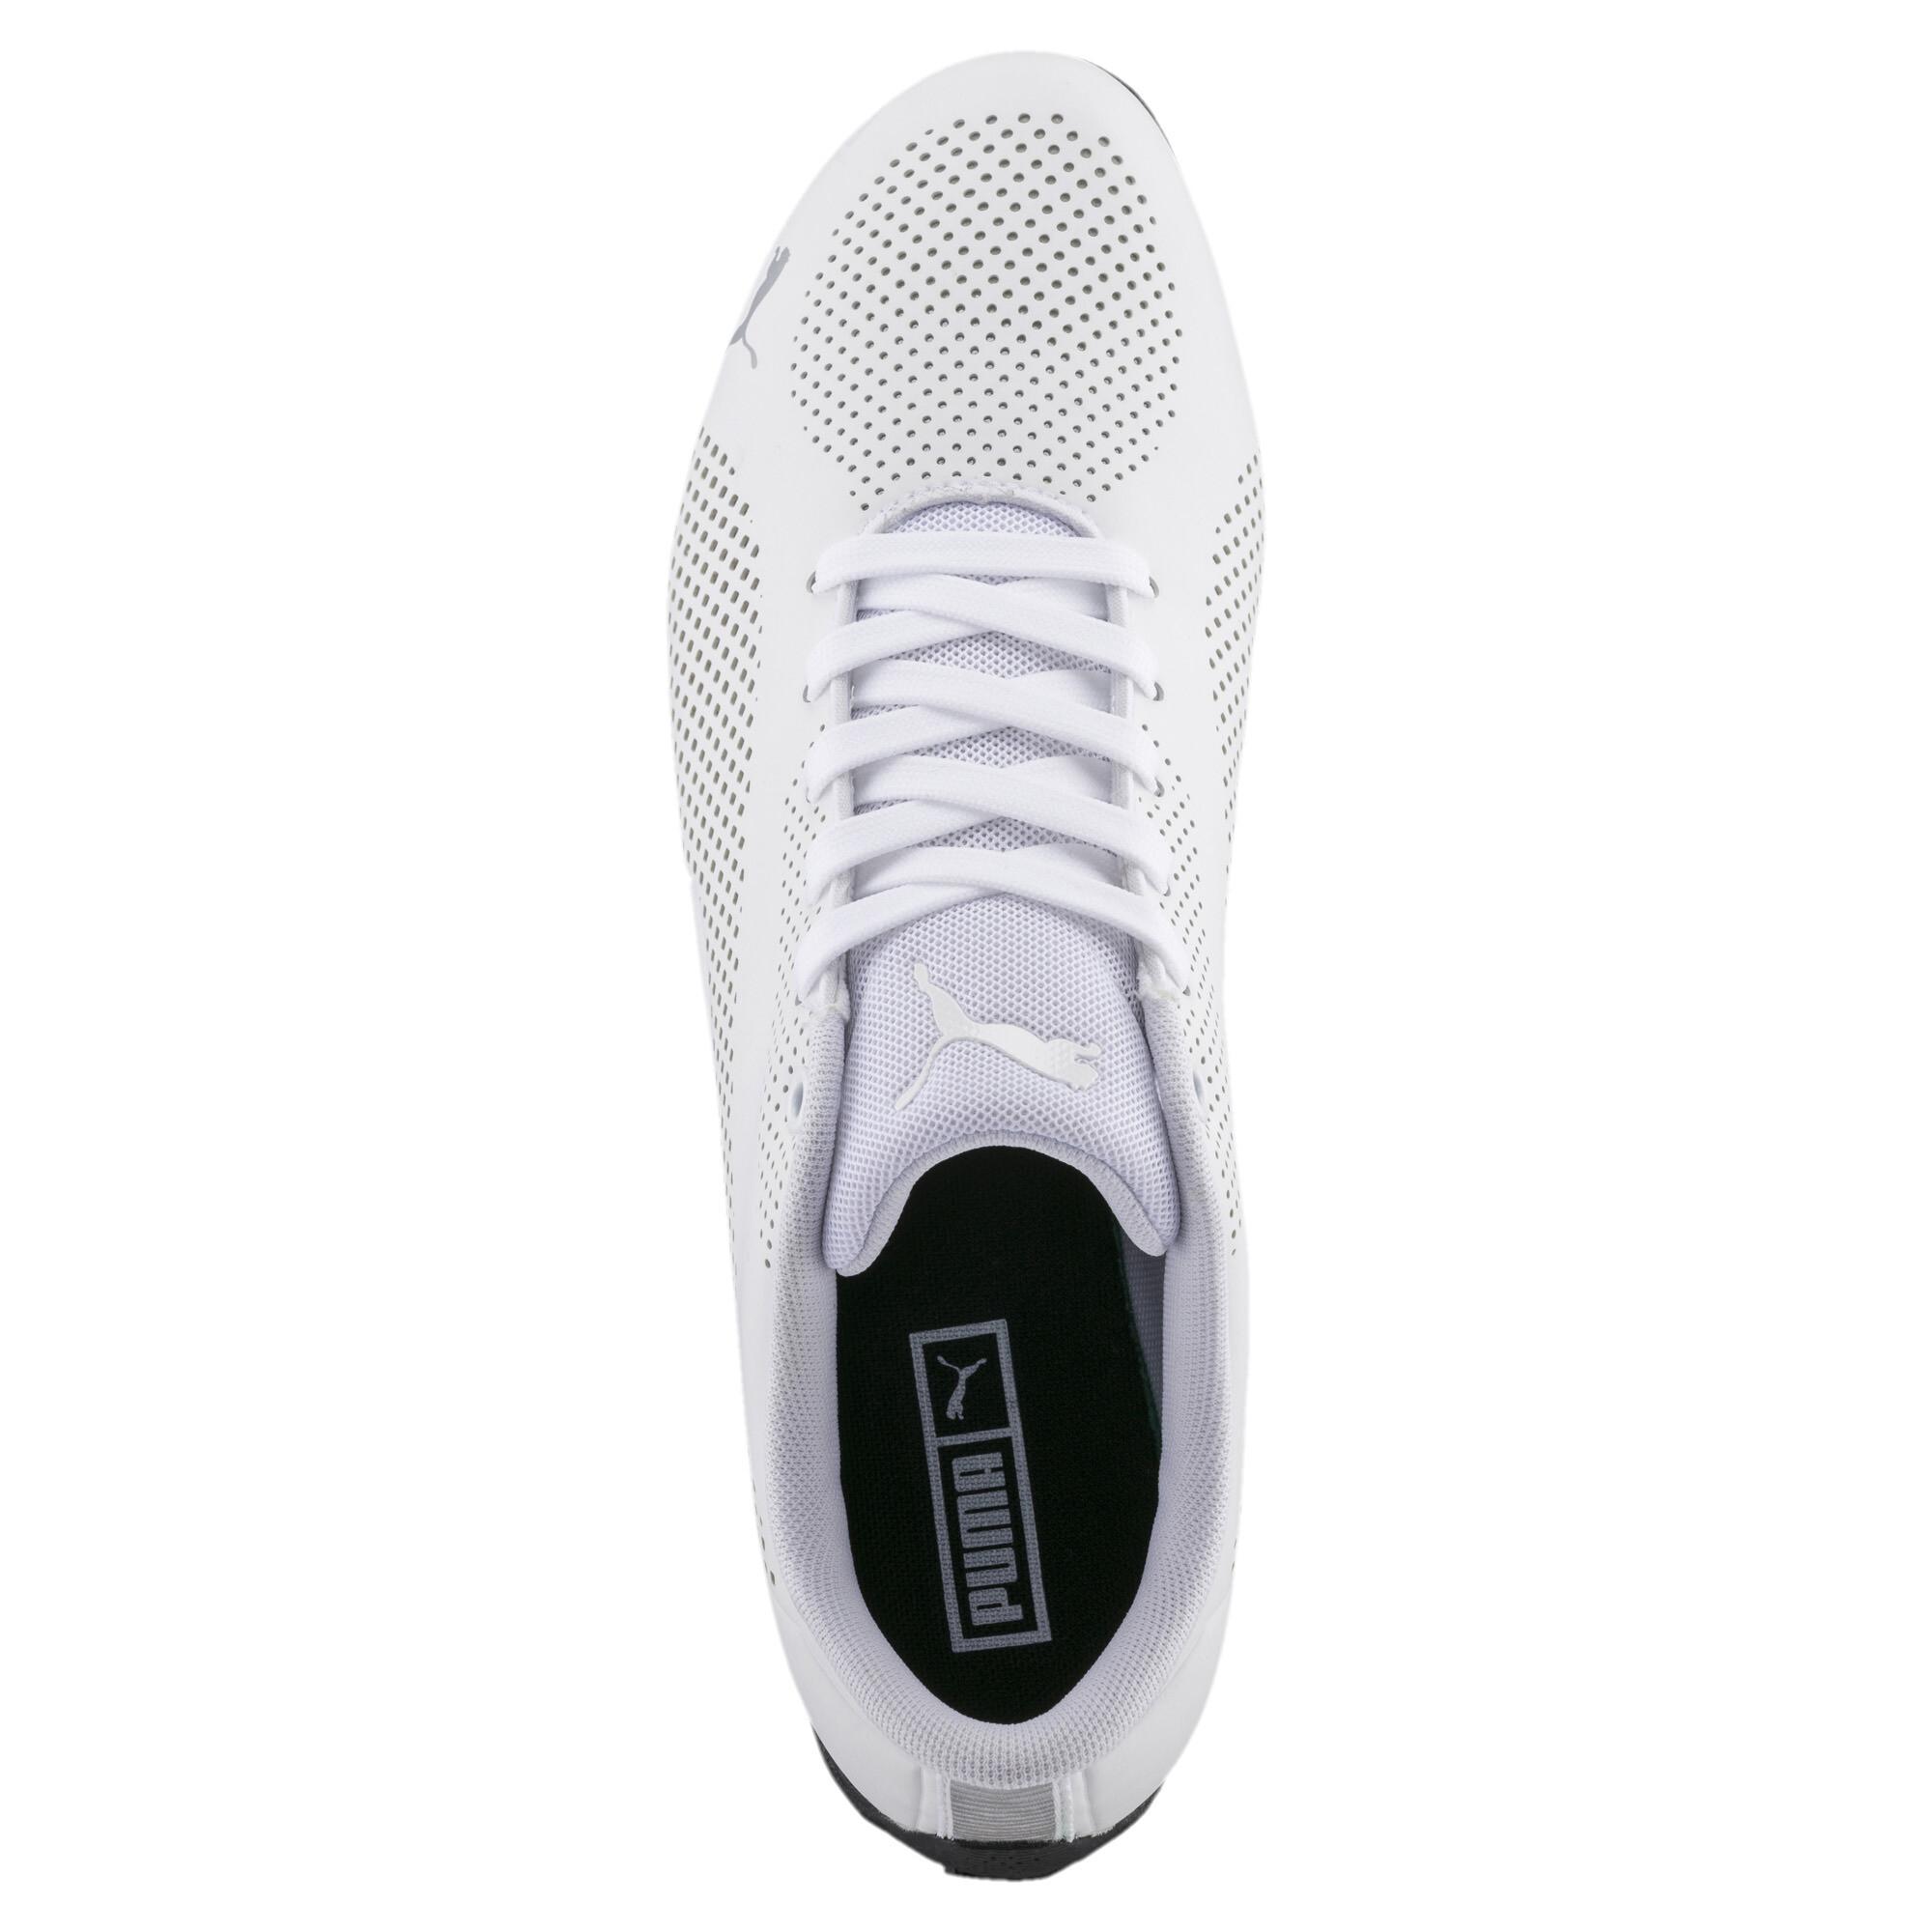 PUMA-Men-039-s-Drift-Cat-Ultra-Reflective-Shoes thumbnail 16